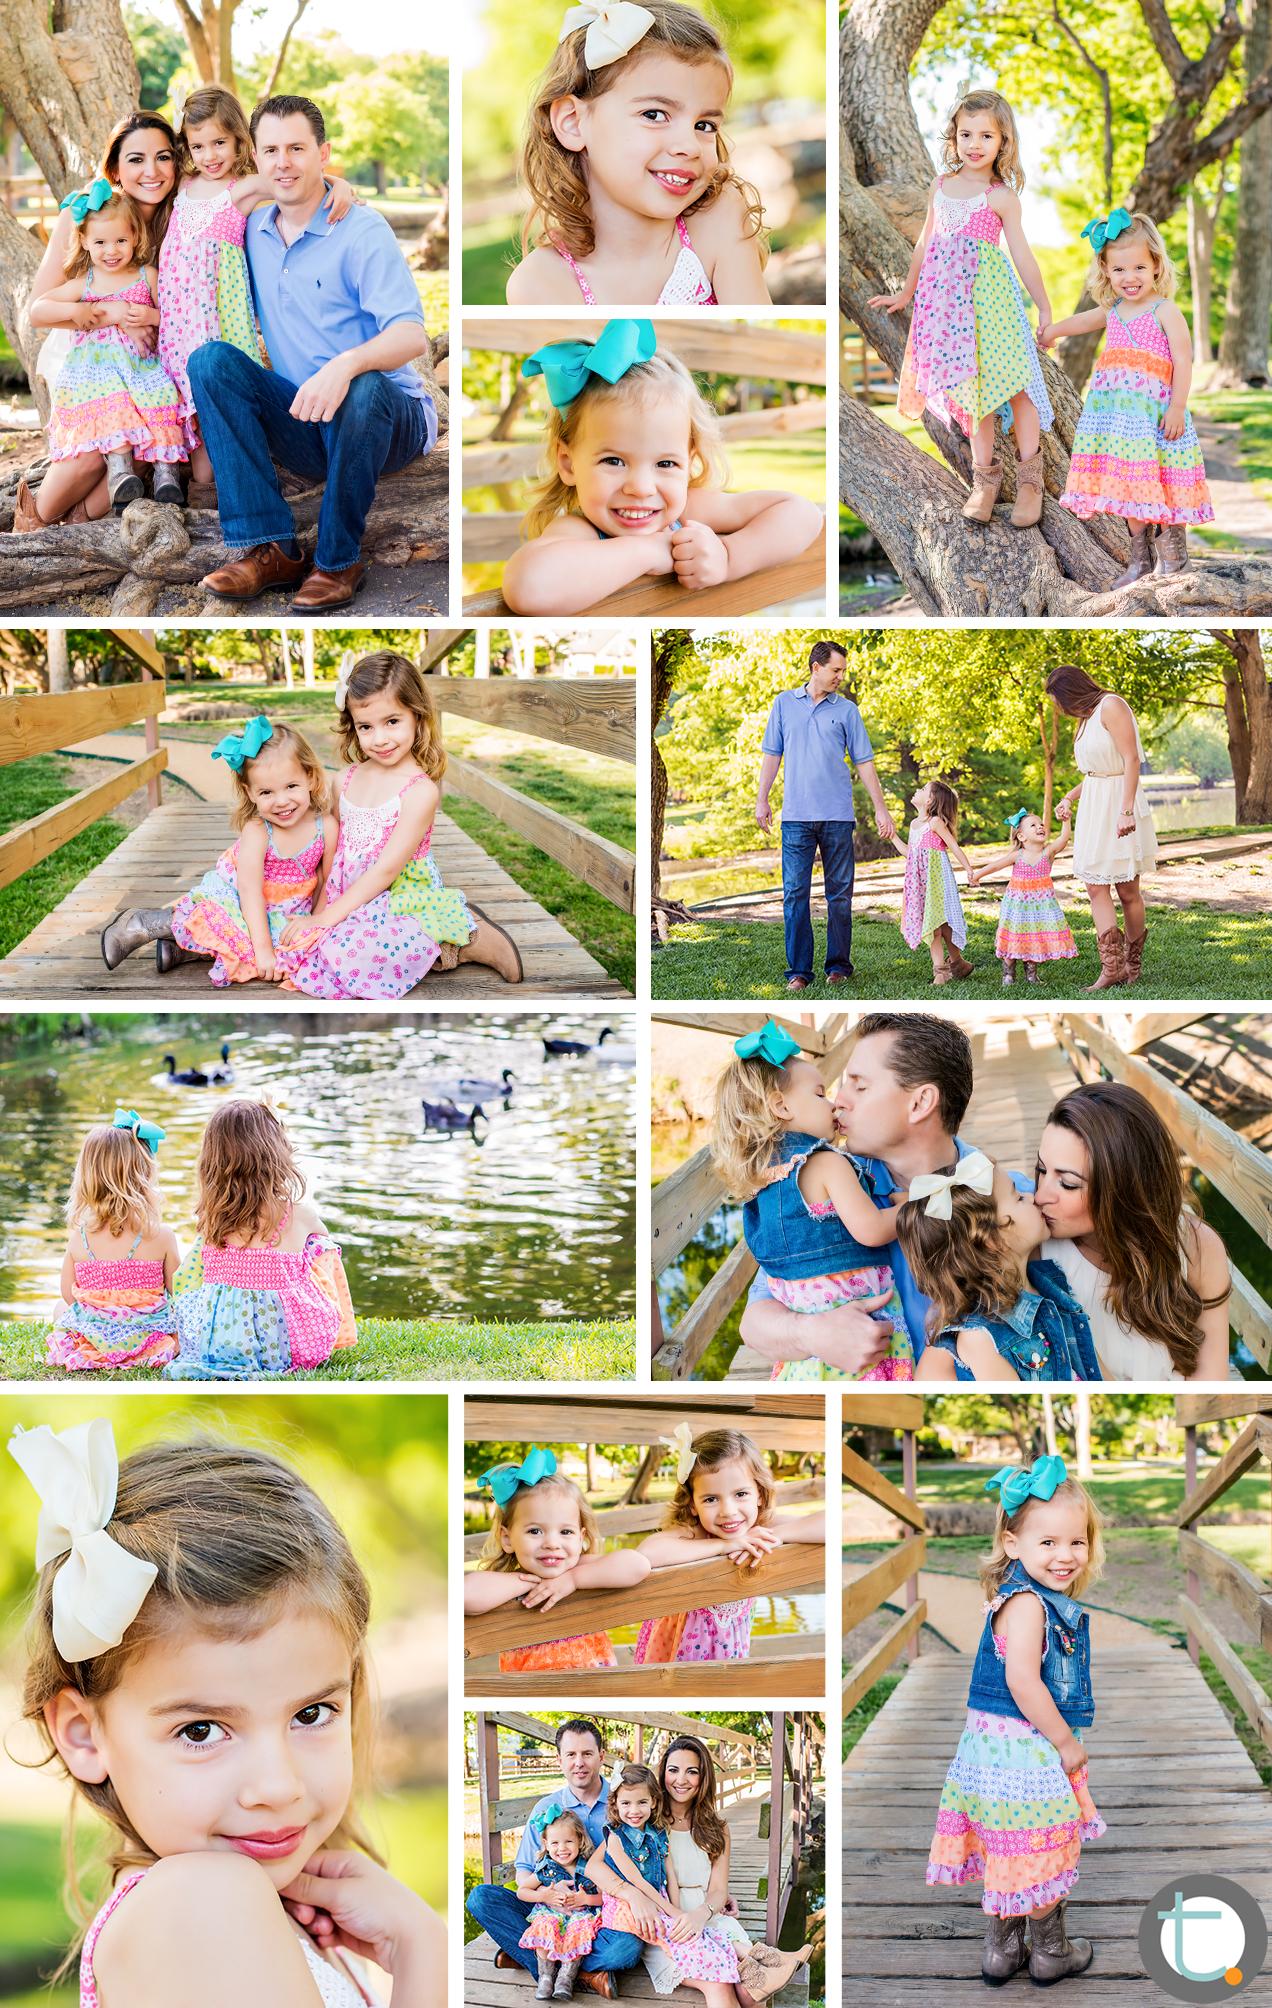 park_dallas_pond_ducks_girls_kids_family_portrait_morning_sunlight_tracyallynphotography